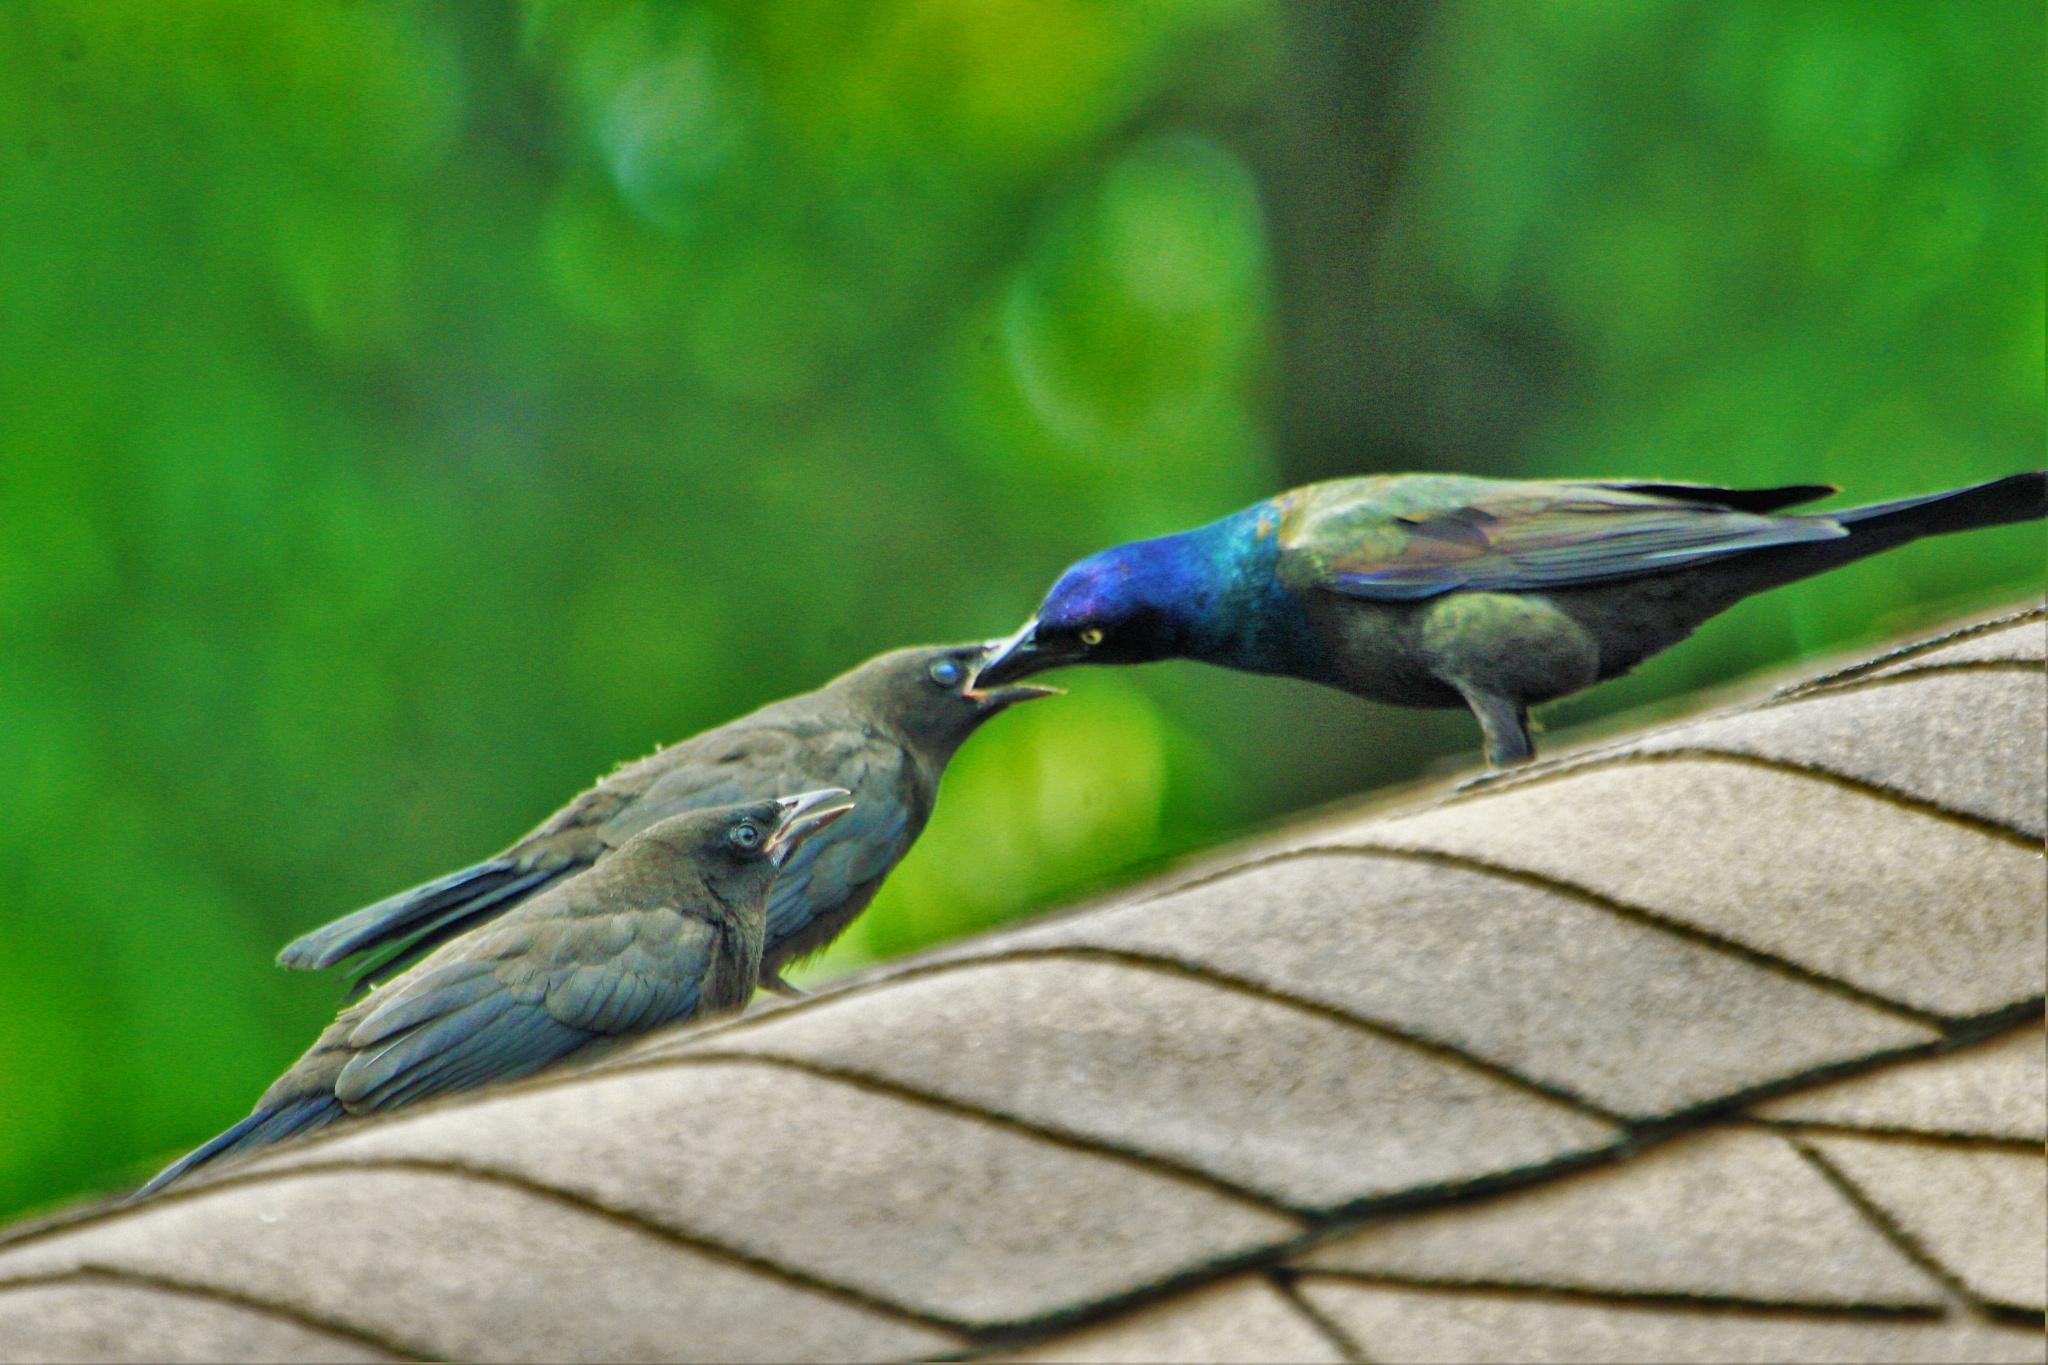 Baby Graco birds feeding form the mother by Matthew Brian Greffe